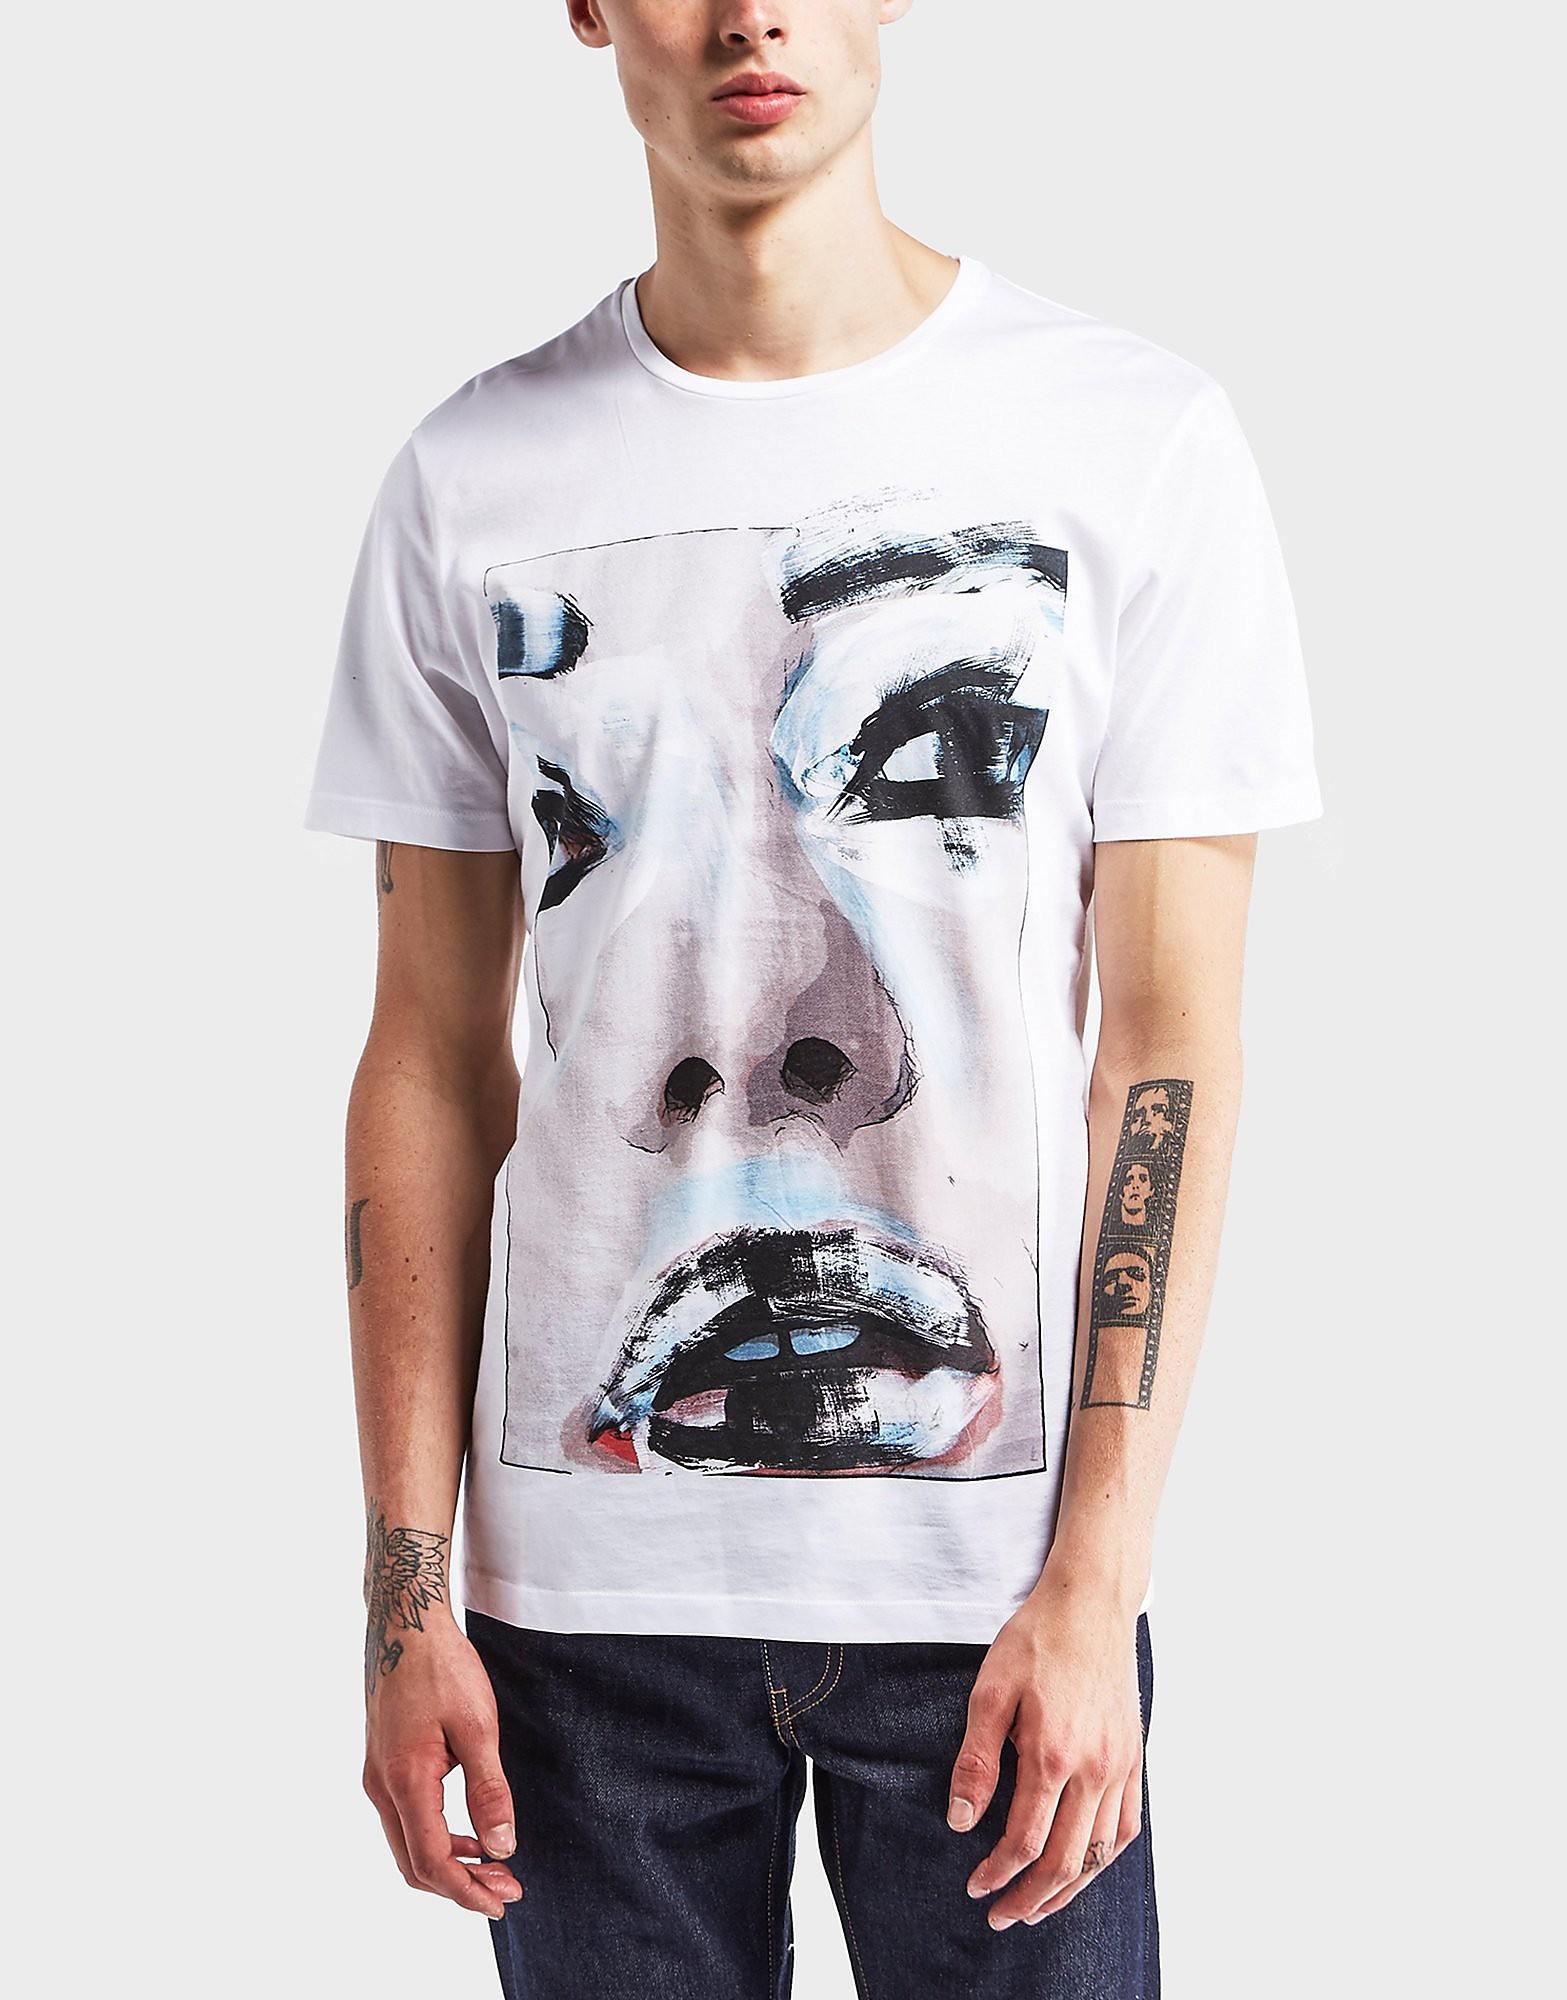 Antony Morato Portrait Short Sleeve T-Shirt